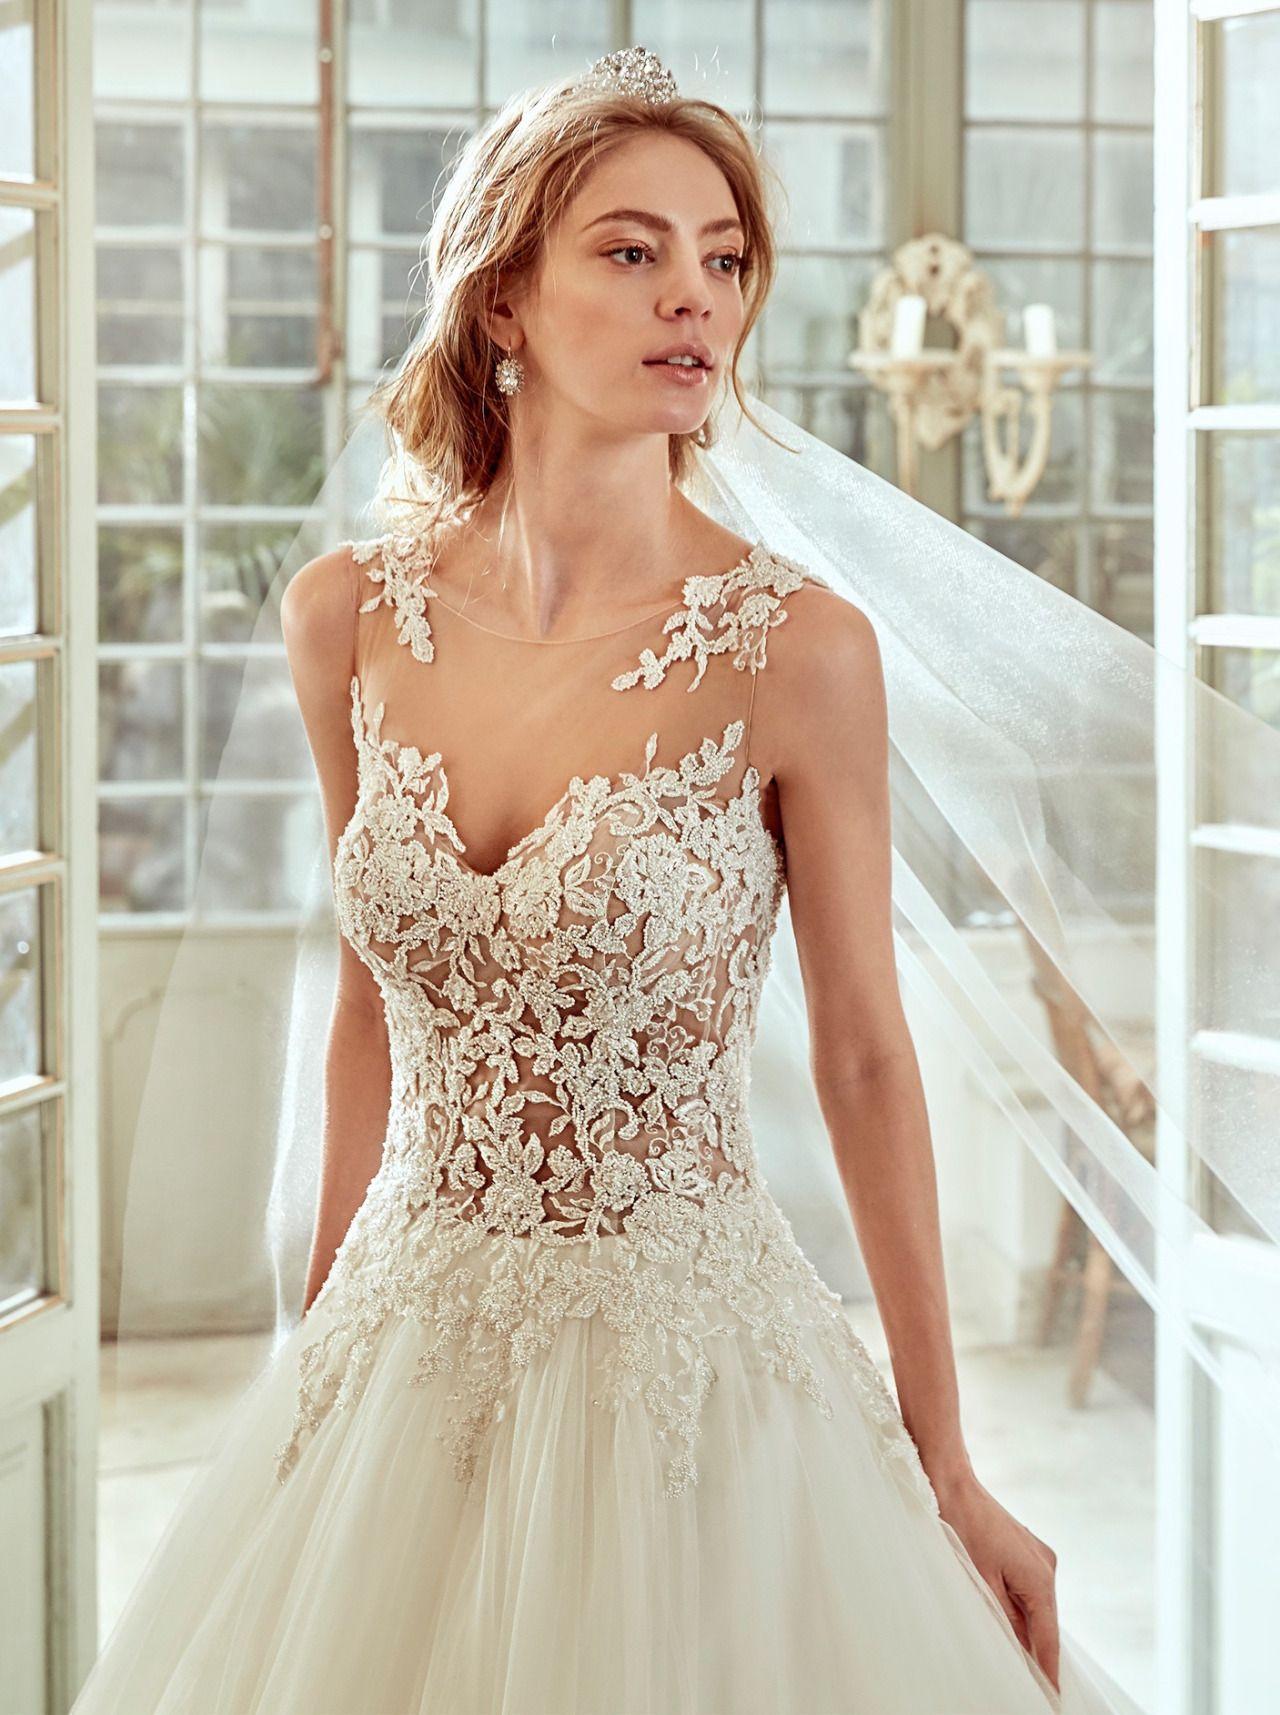 Princess Wedding Dress Tumblr Gelinlikler 2018 Pinterest